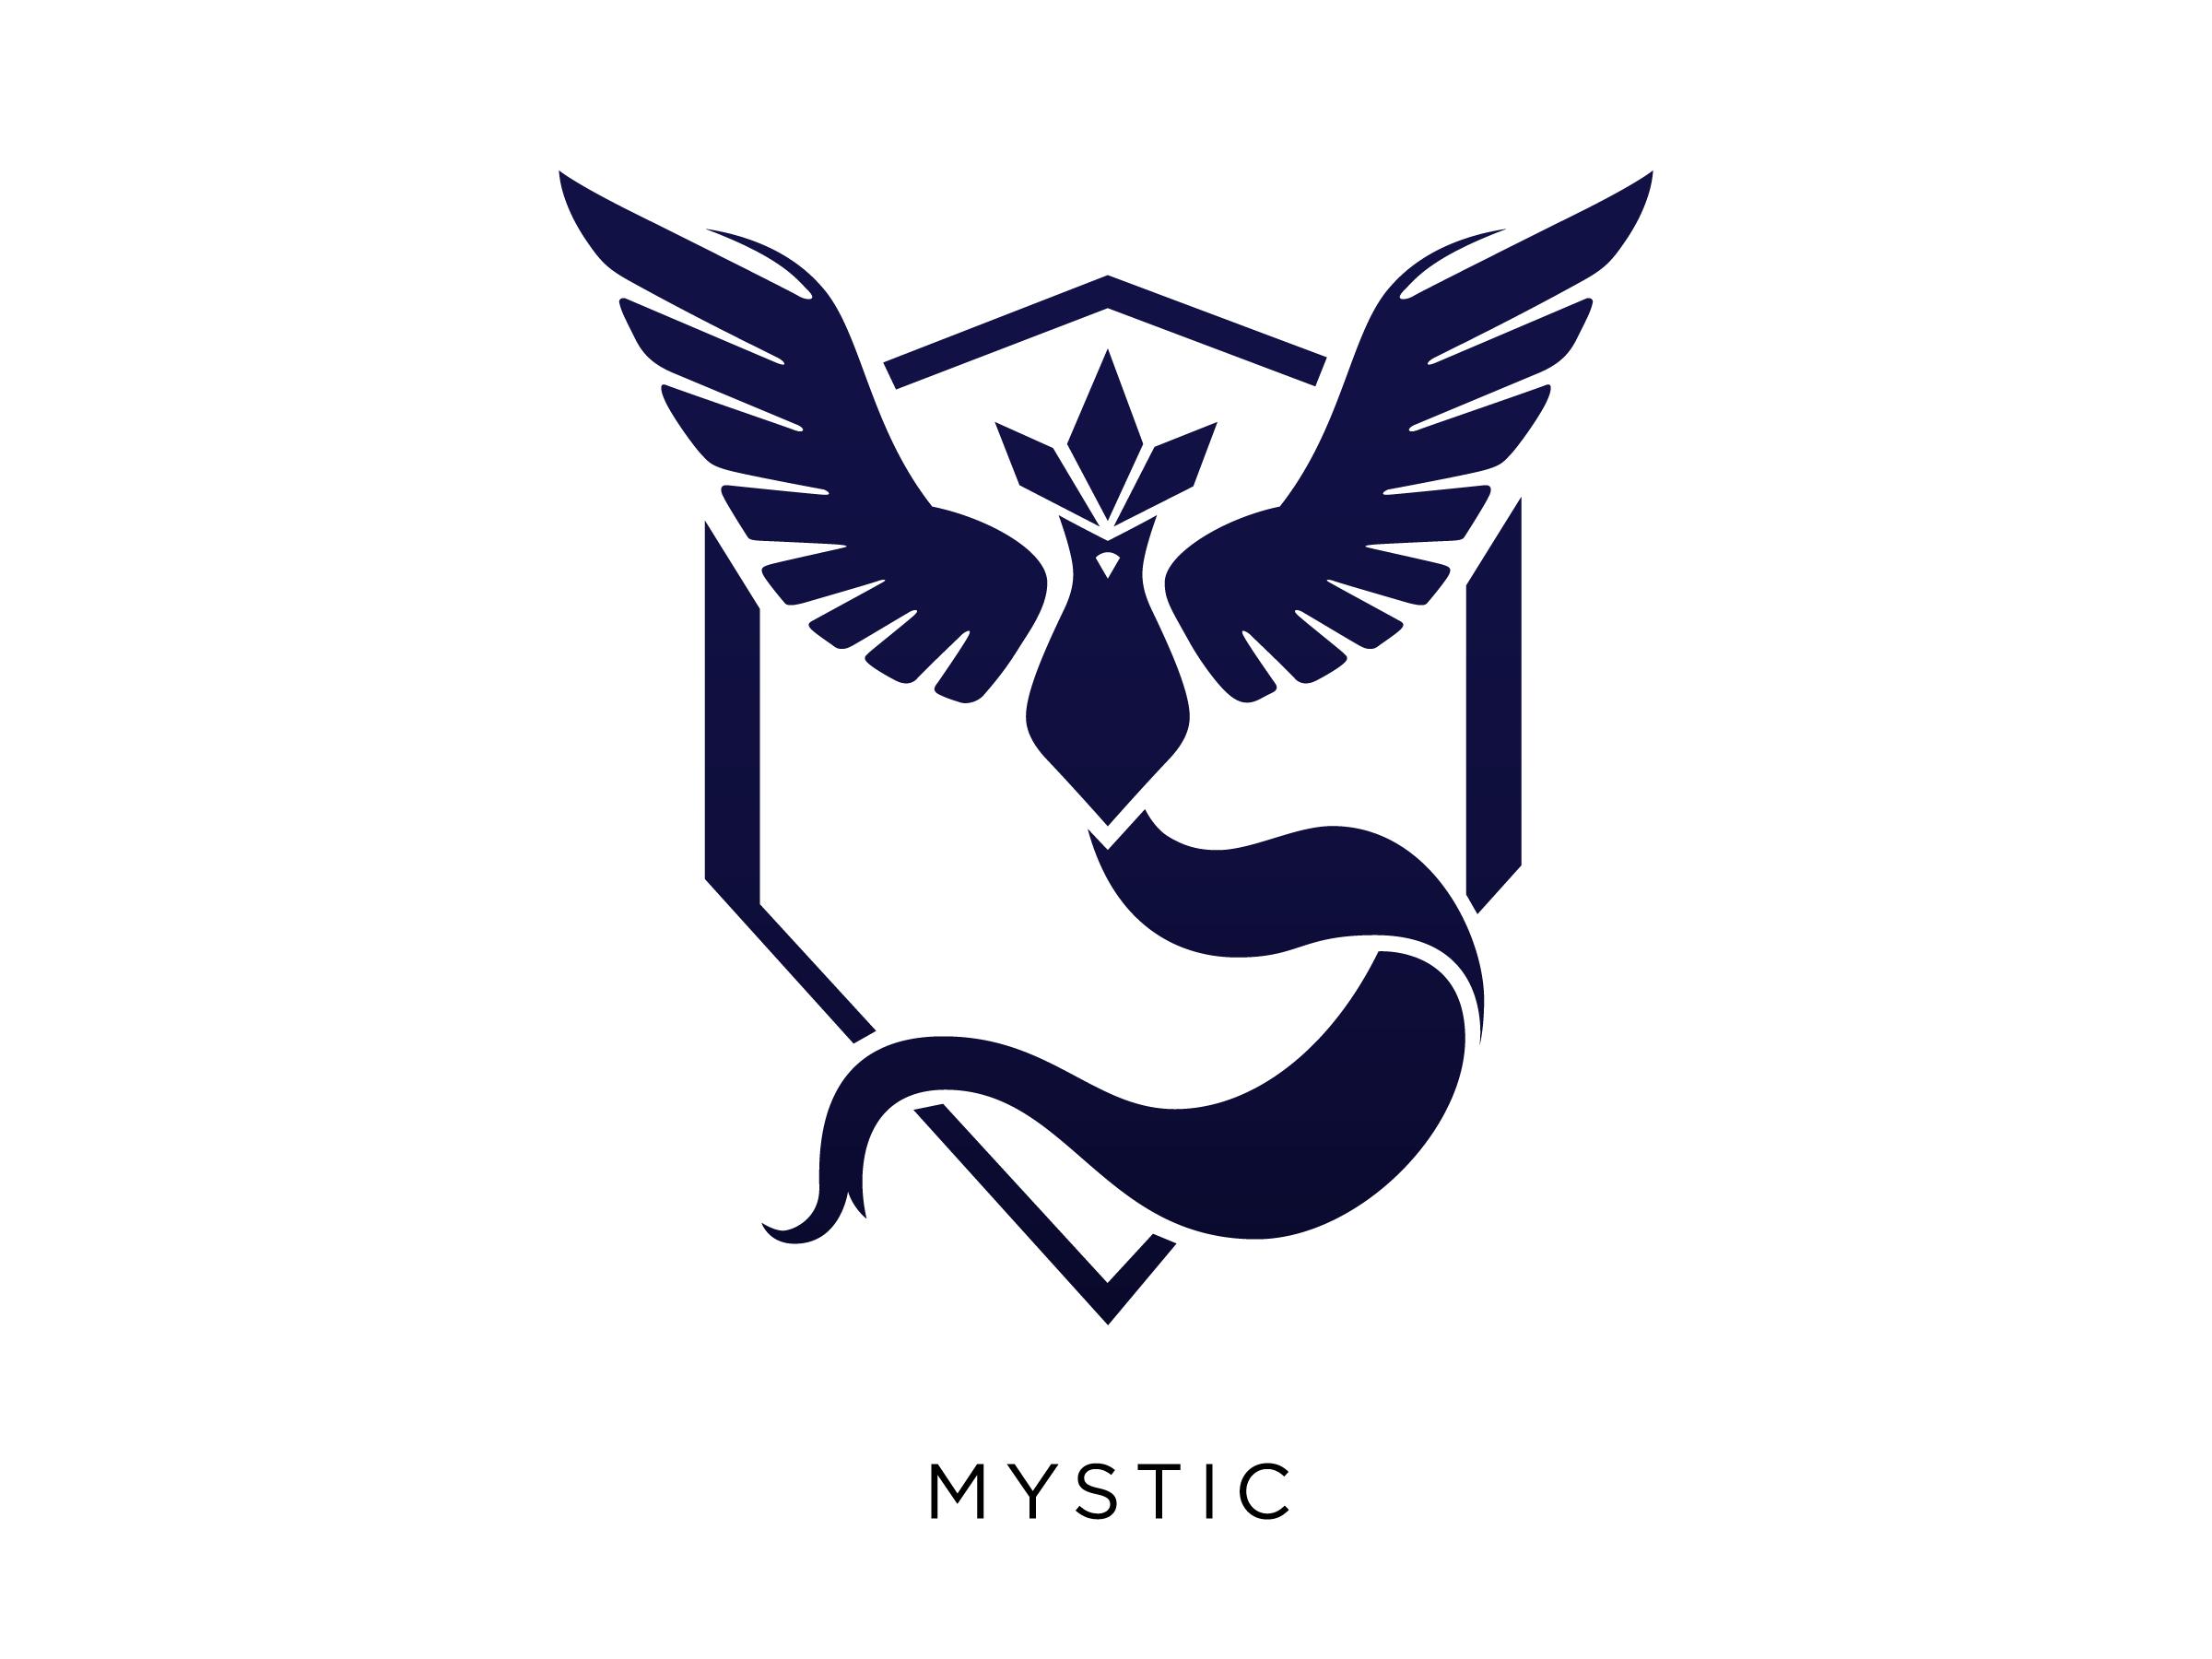 Pokemongo-team-logos-mystic.png By Meritt Thomas